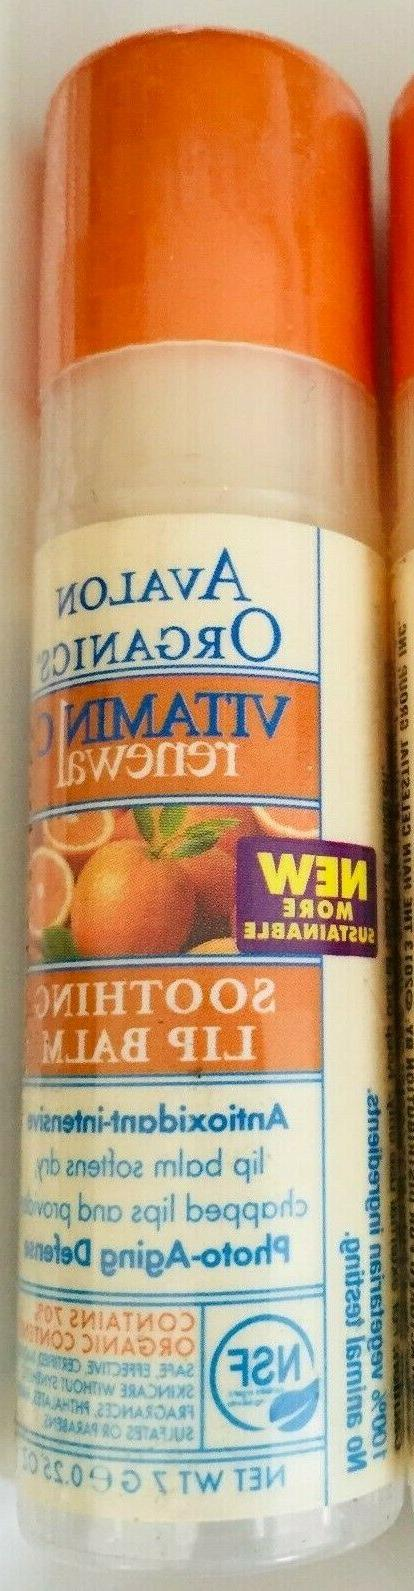 1 vitamin c renewal and intense defense